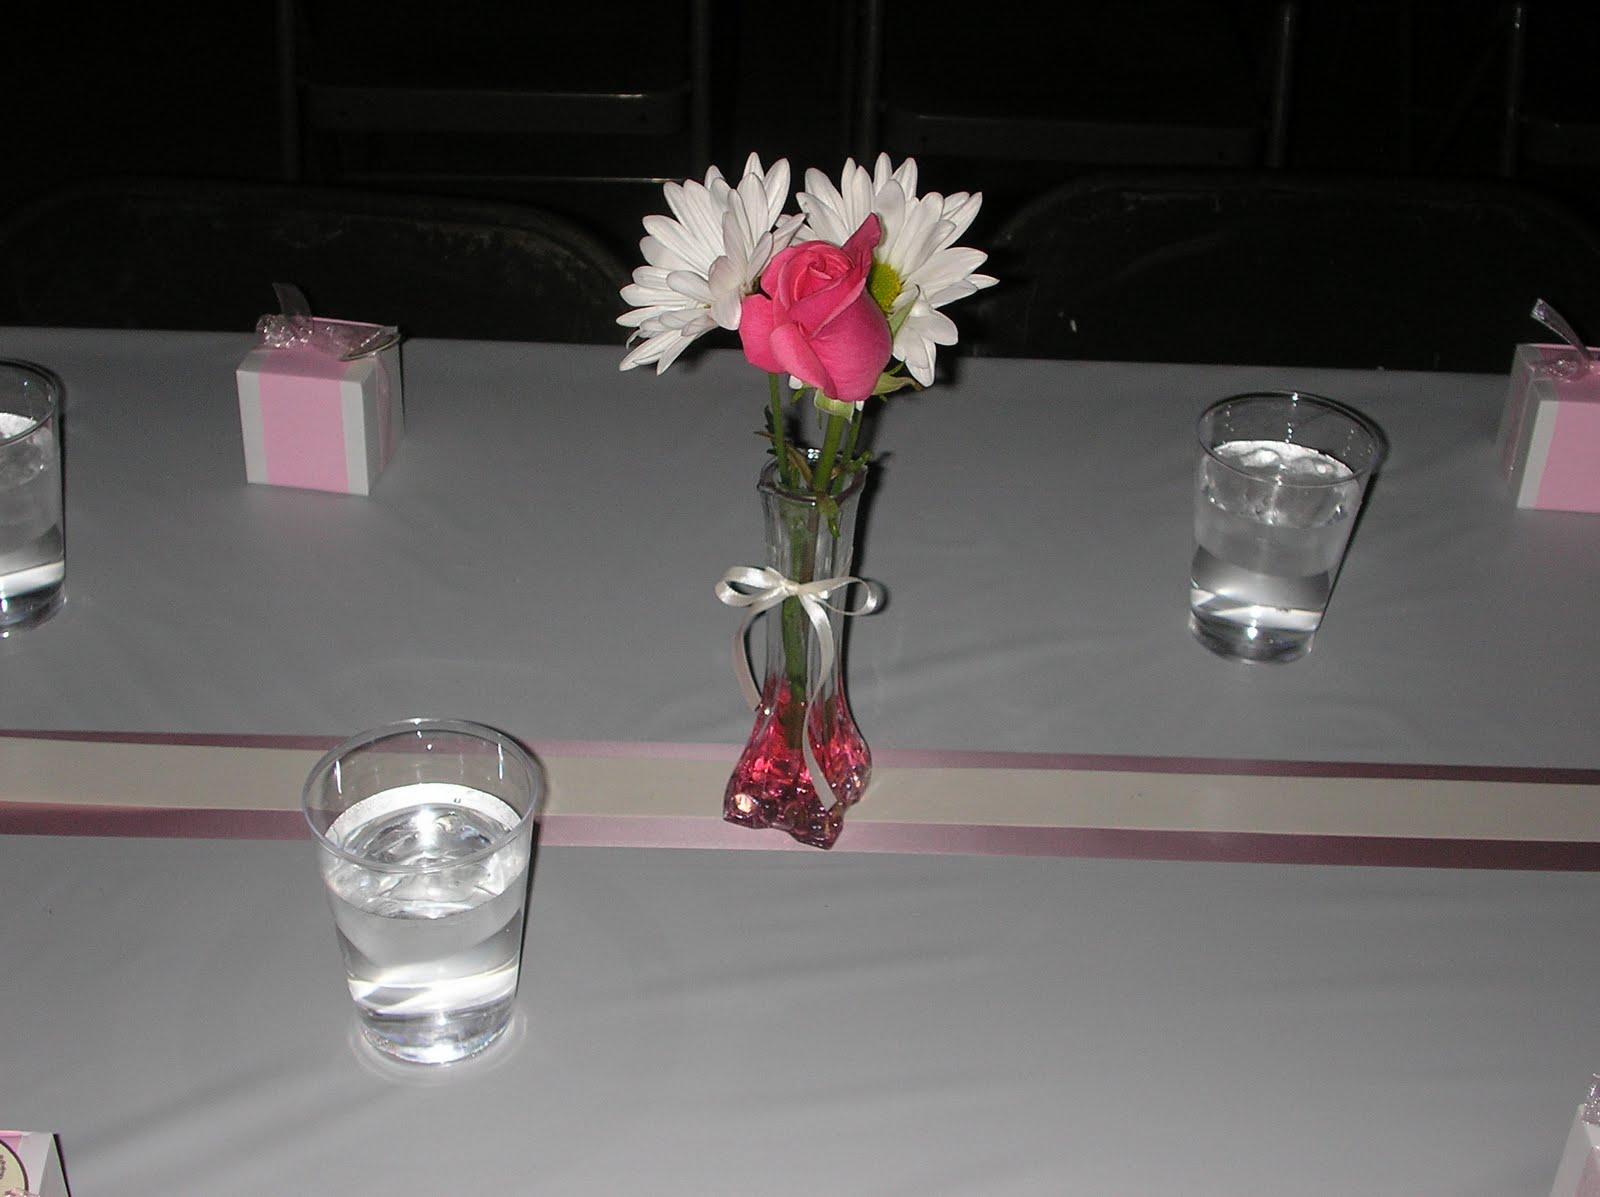 Idee Deco Vase Rond wedding plans!!: decoration ideas